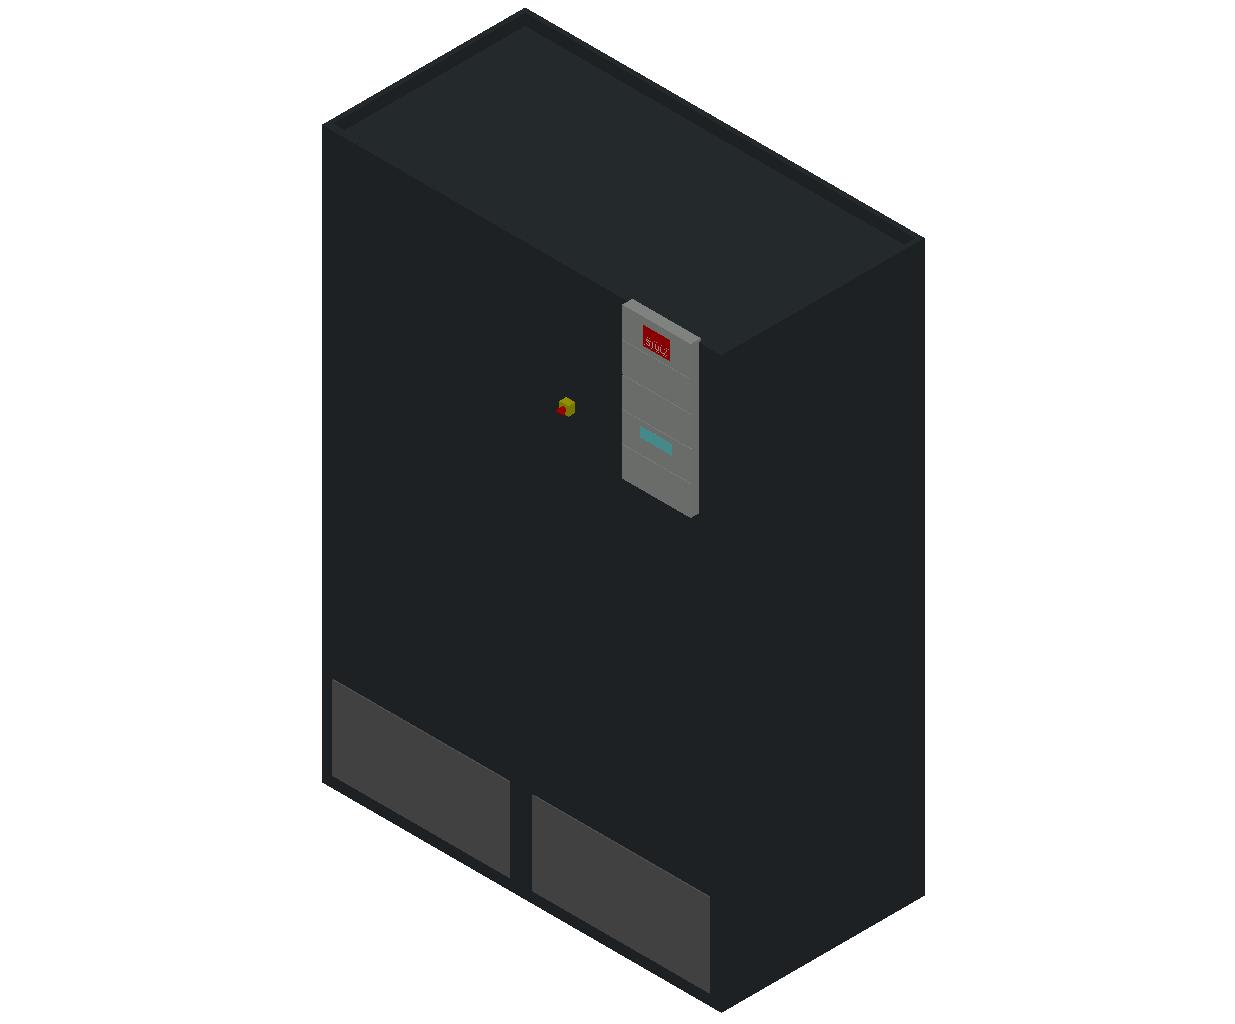 HC_Air Conditioner_Indoor Unit_MEPcontent_STULZ_CyberAir 3PRO_ASR_Dual Circuit A_ASR_532_A_INT-EN.dwg